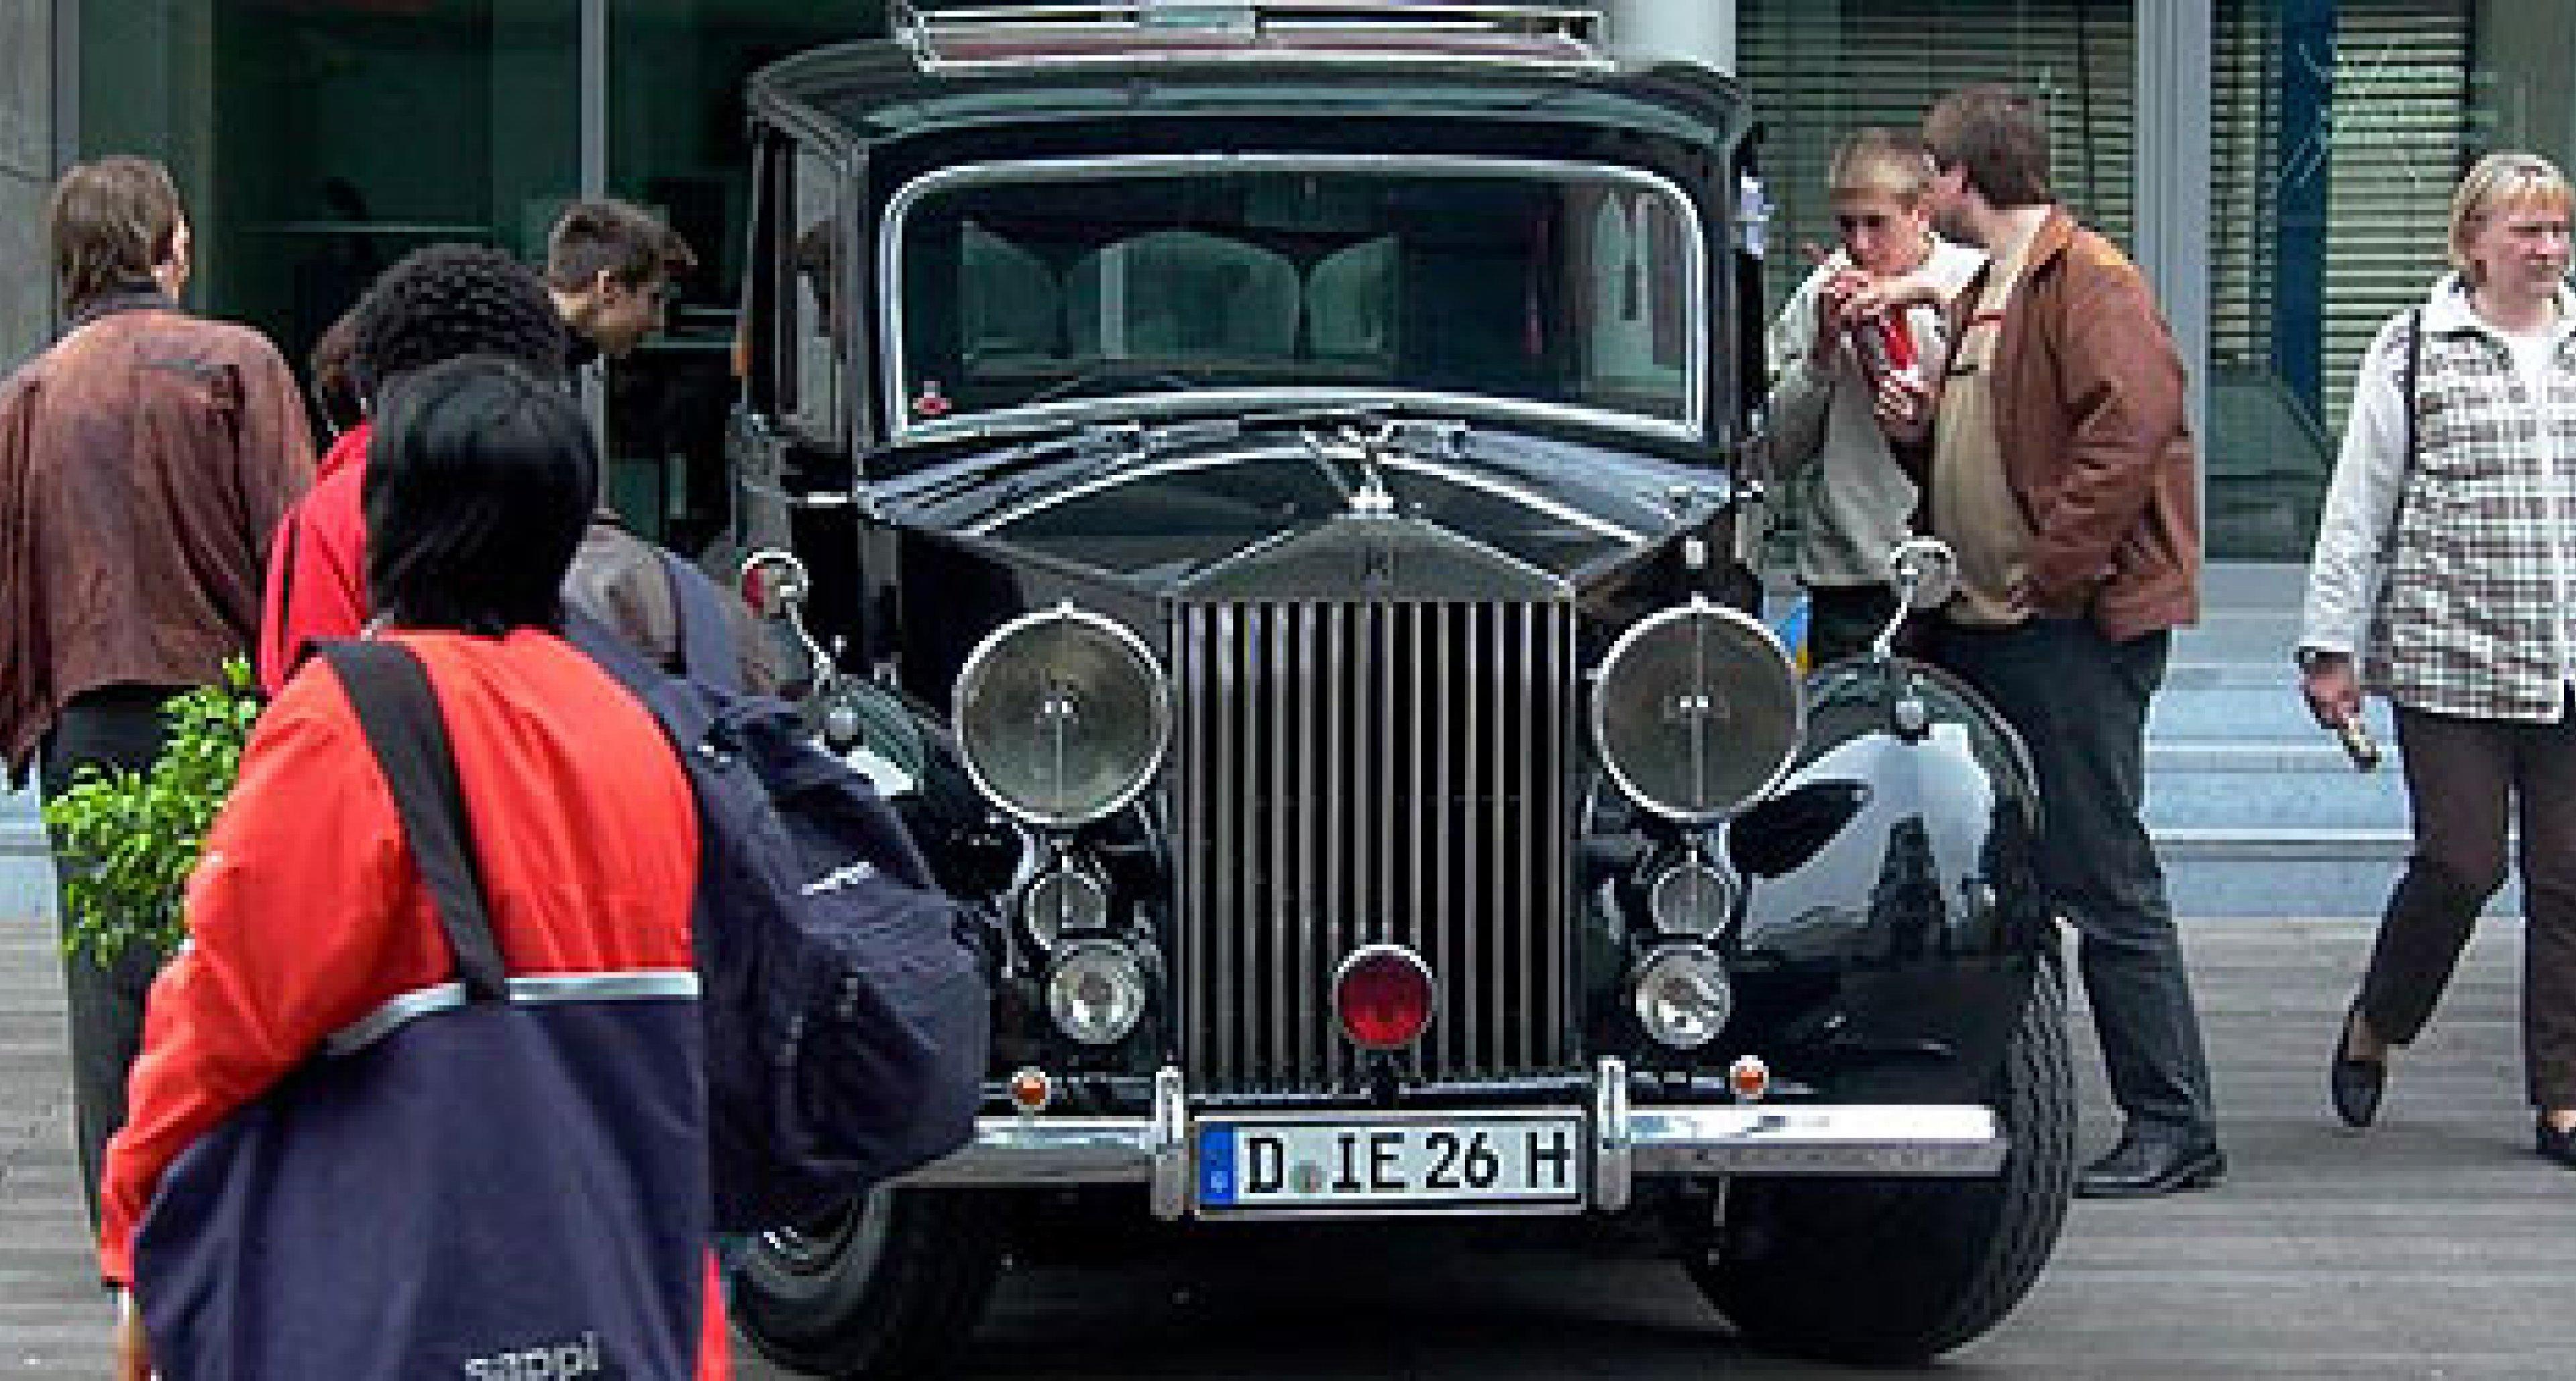 Rhein-Classic 2004: Oldtimerfestival Düsseldorf